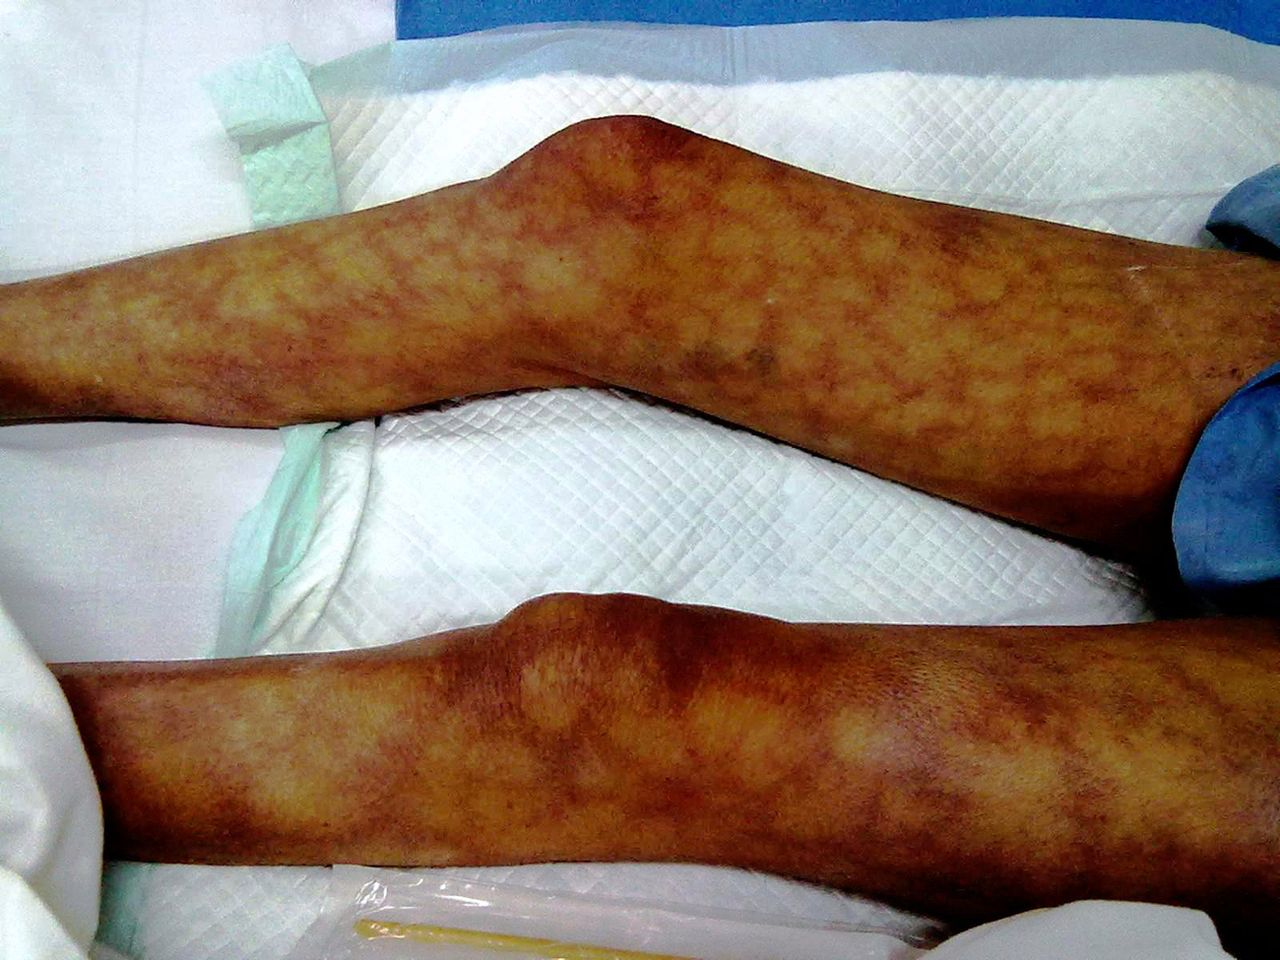 Livedo reticularis heralding hypercalcaemia of malignancy